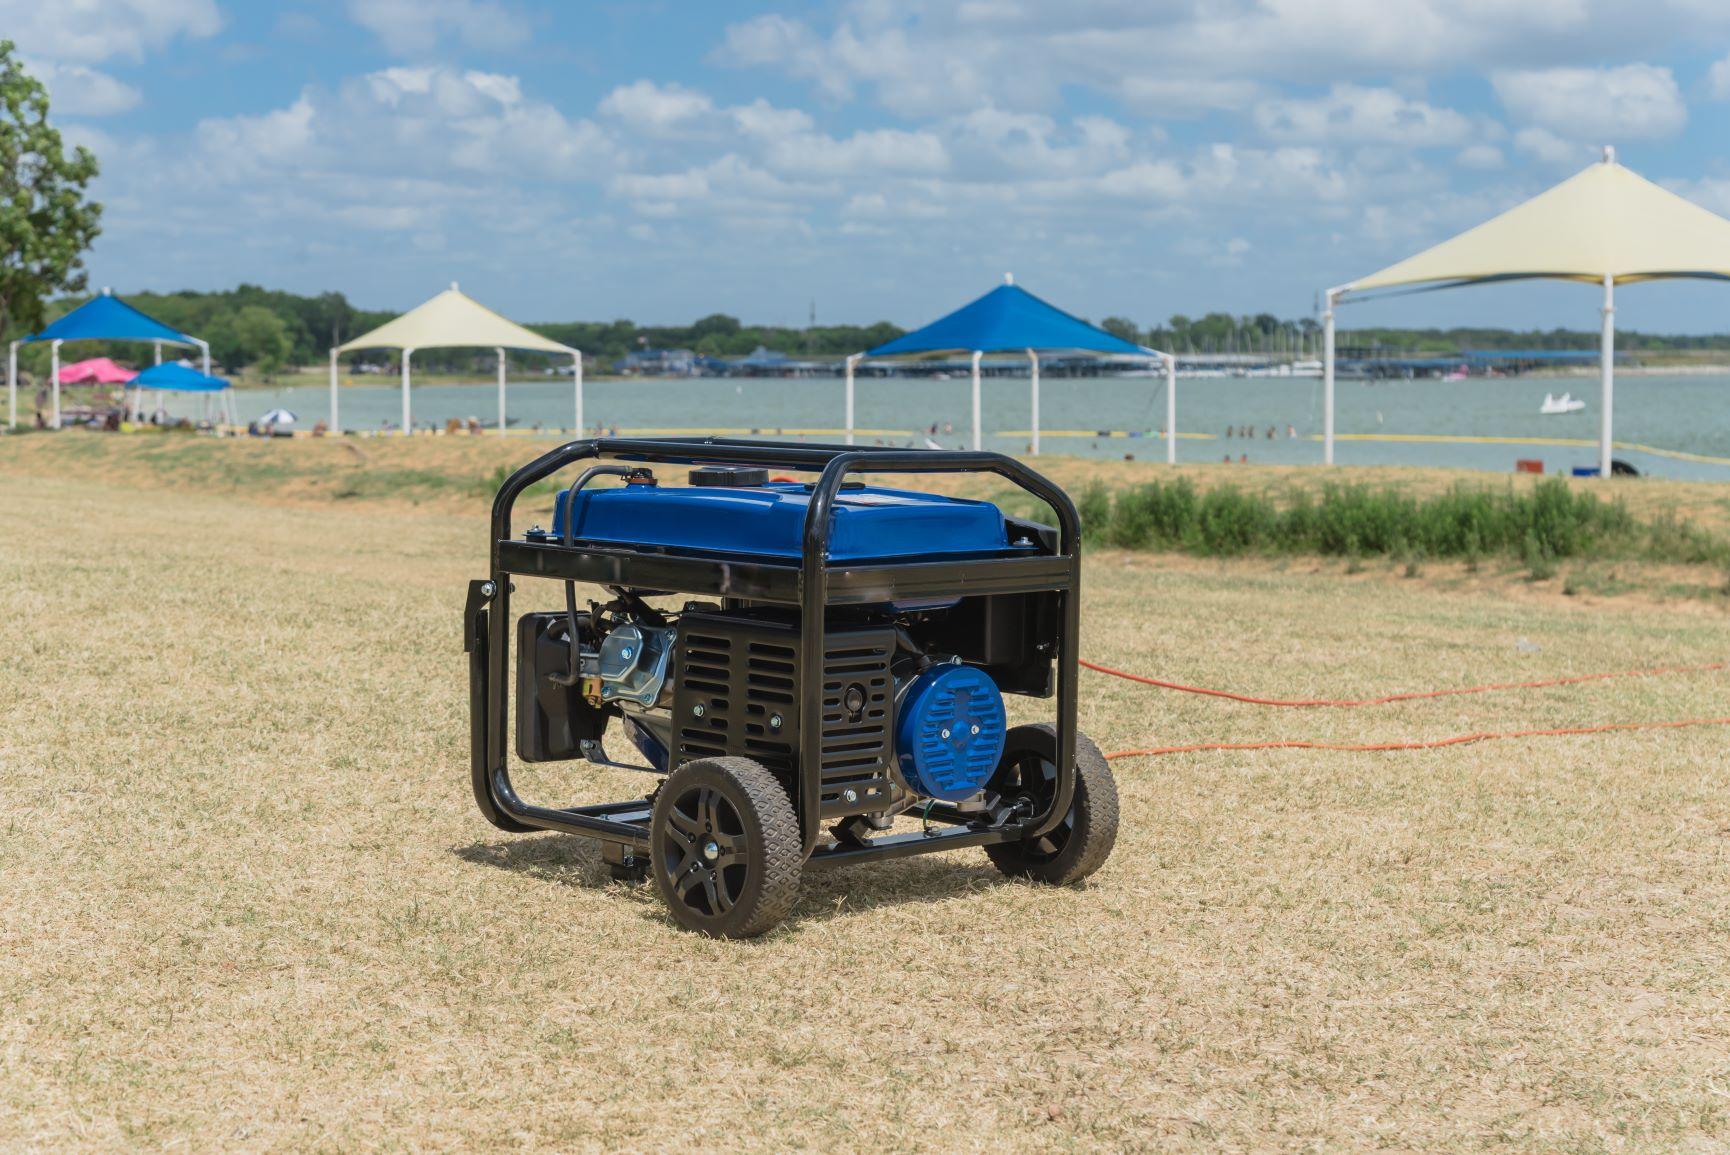 Best 5,000 Watt Generator